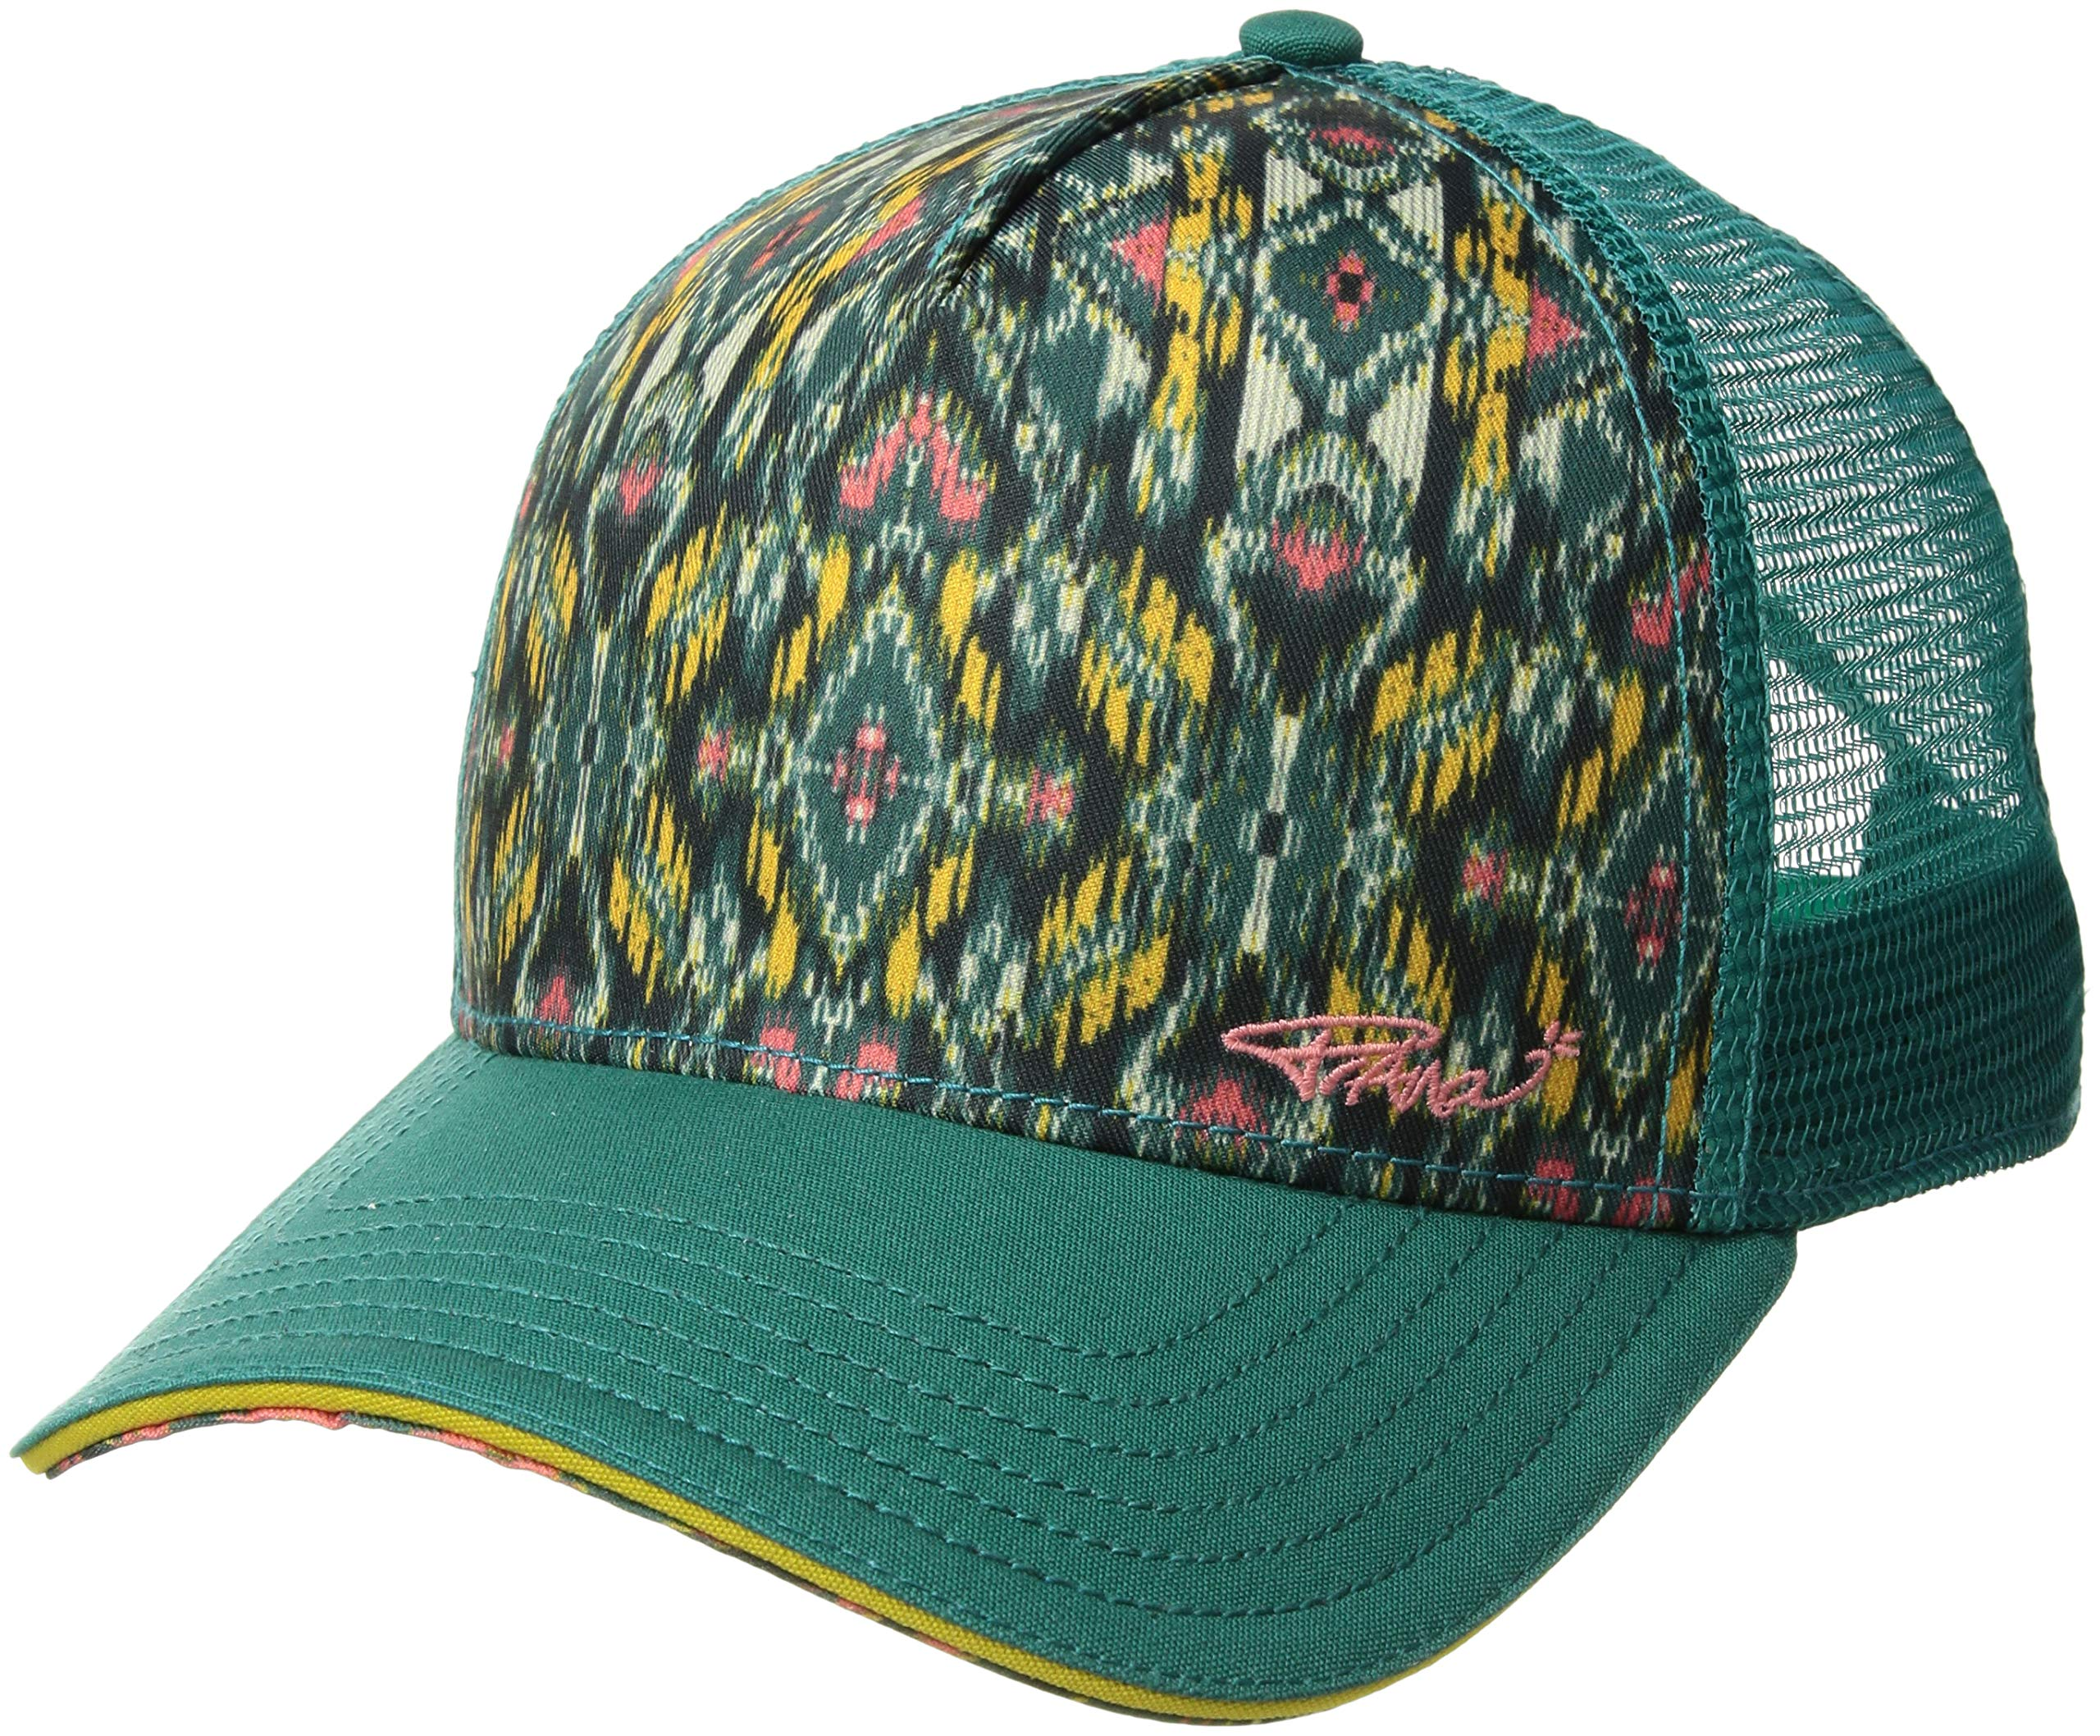 prAna Women's La Viva Trucker Cold Weather Hats, One Size, Teal Flores